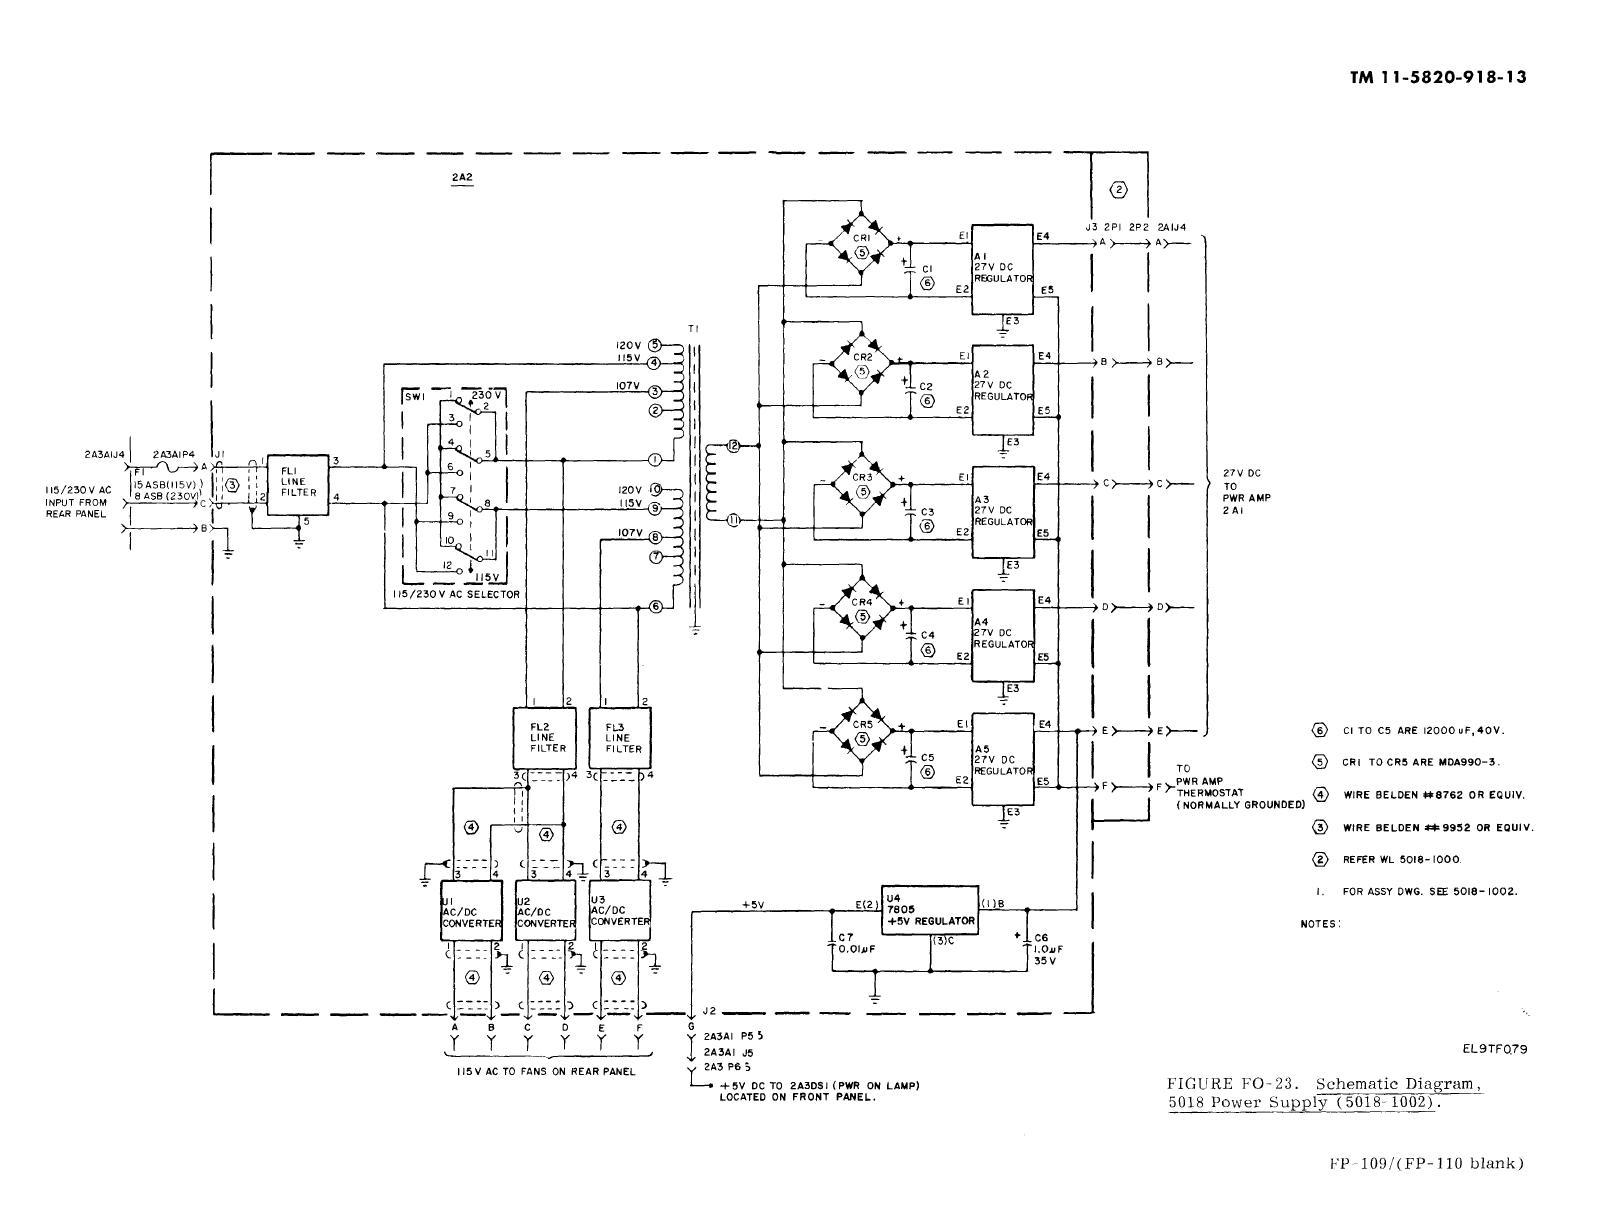 Figure Fo 23 Schematic Diagram Power Supply